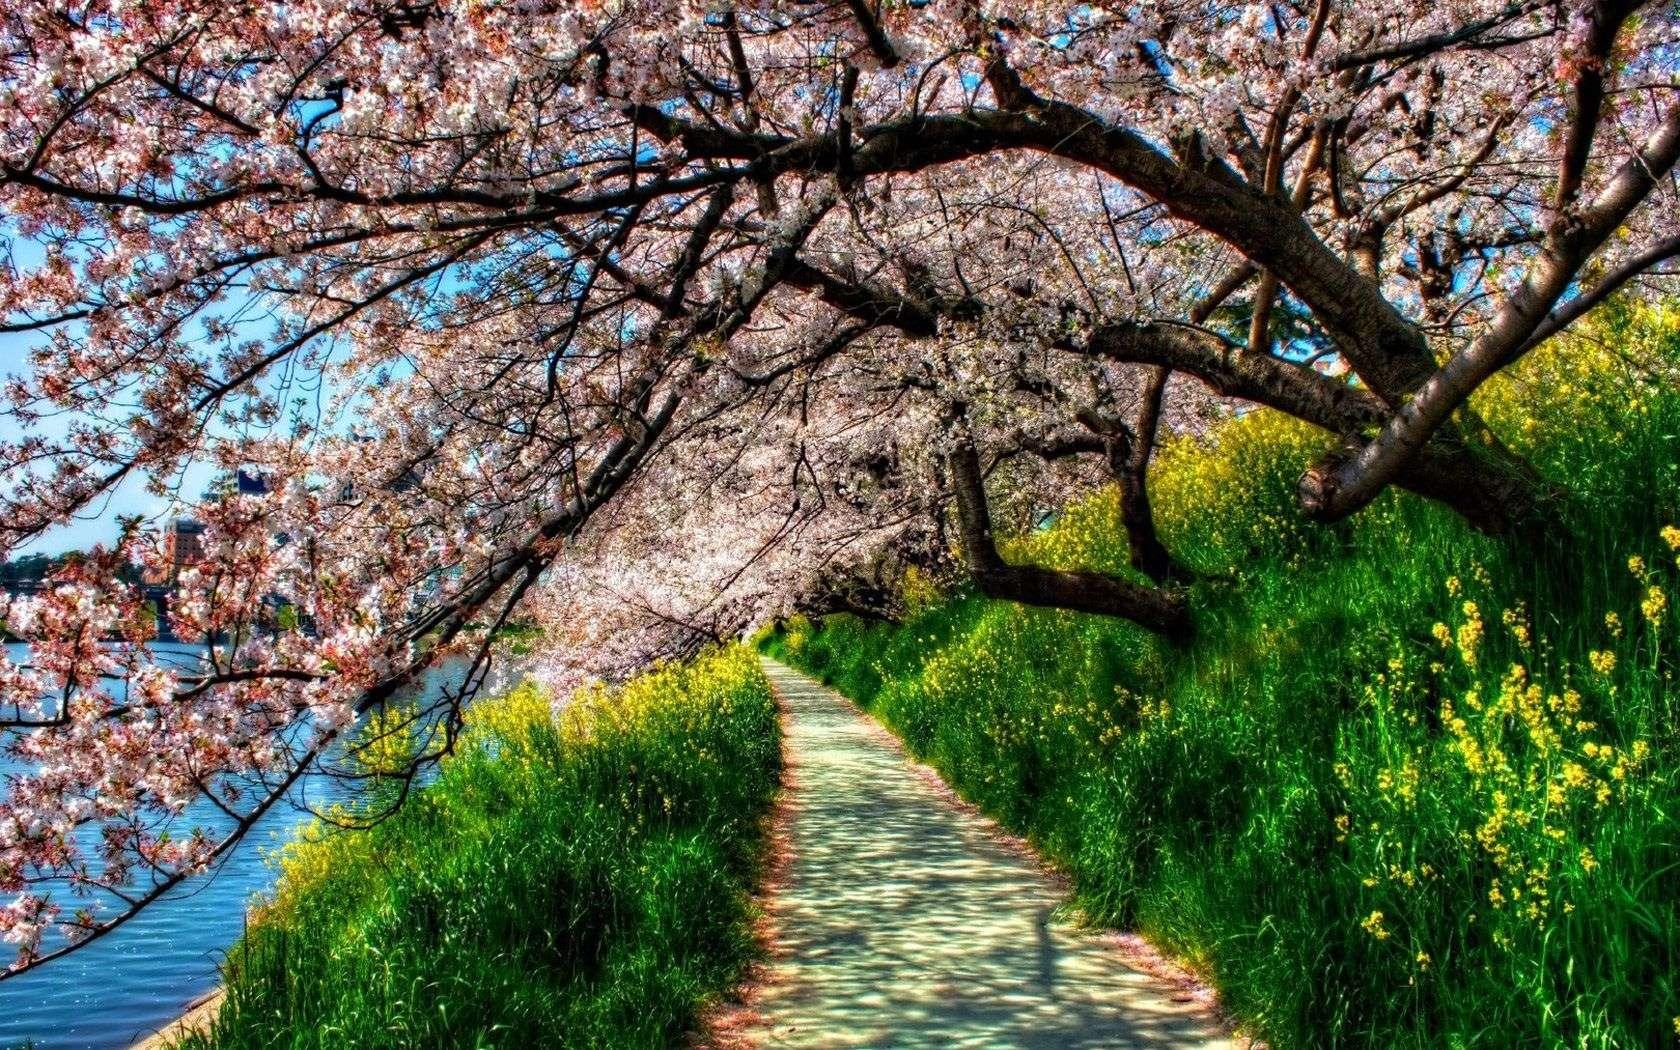 Spring Nature Wallpaper 017